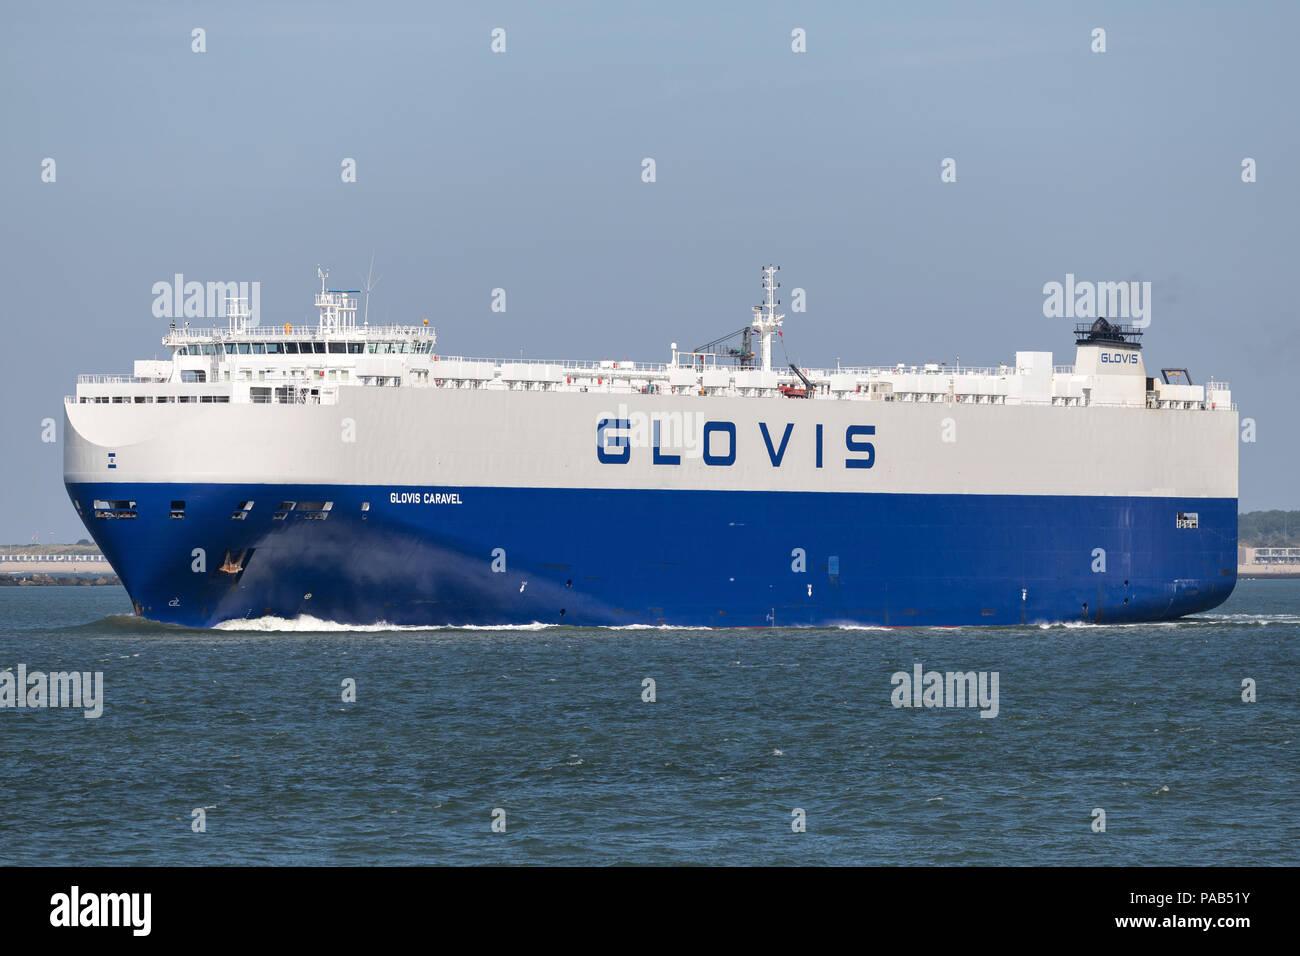 GLOVIS CARAVEL oubound Rotterdam. Hyundai Glovis is a logistics company headquartered in Seoul, Korea and part of the Hyundai Kia Automotive Group. - Stock Image